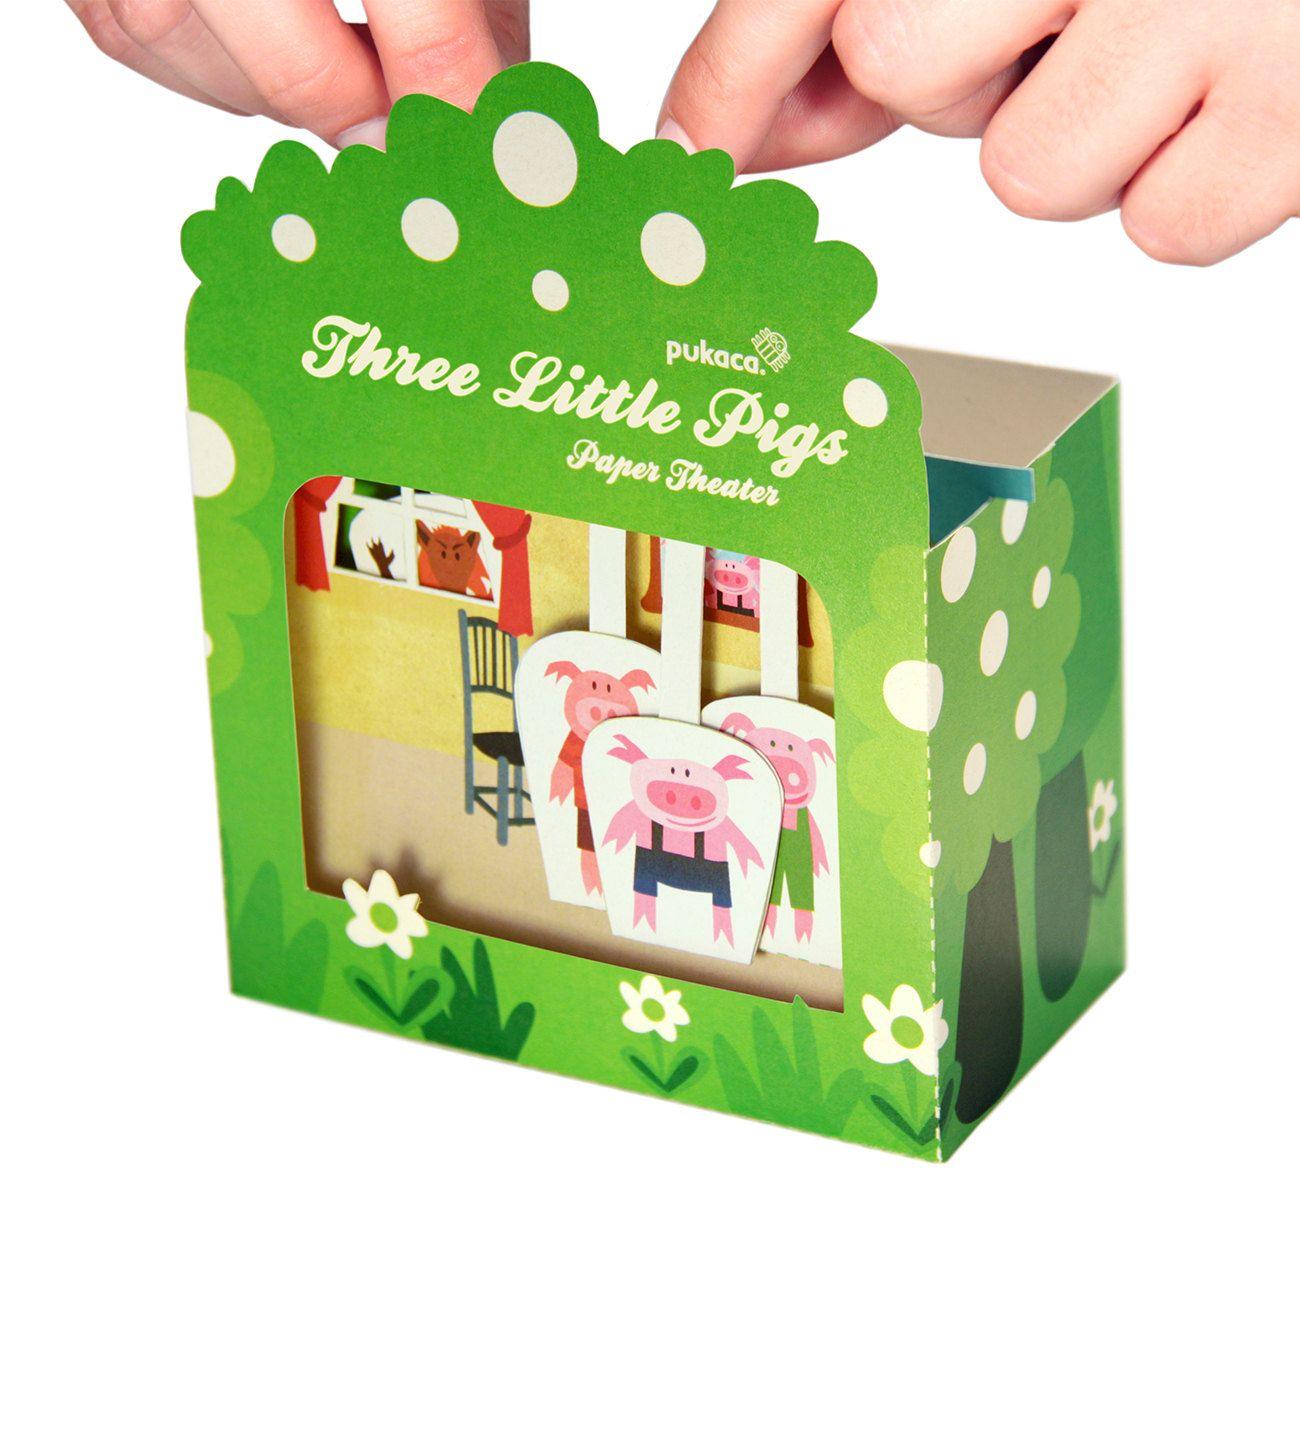 3 Little Pigs Paper Theatre Printable 5